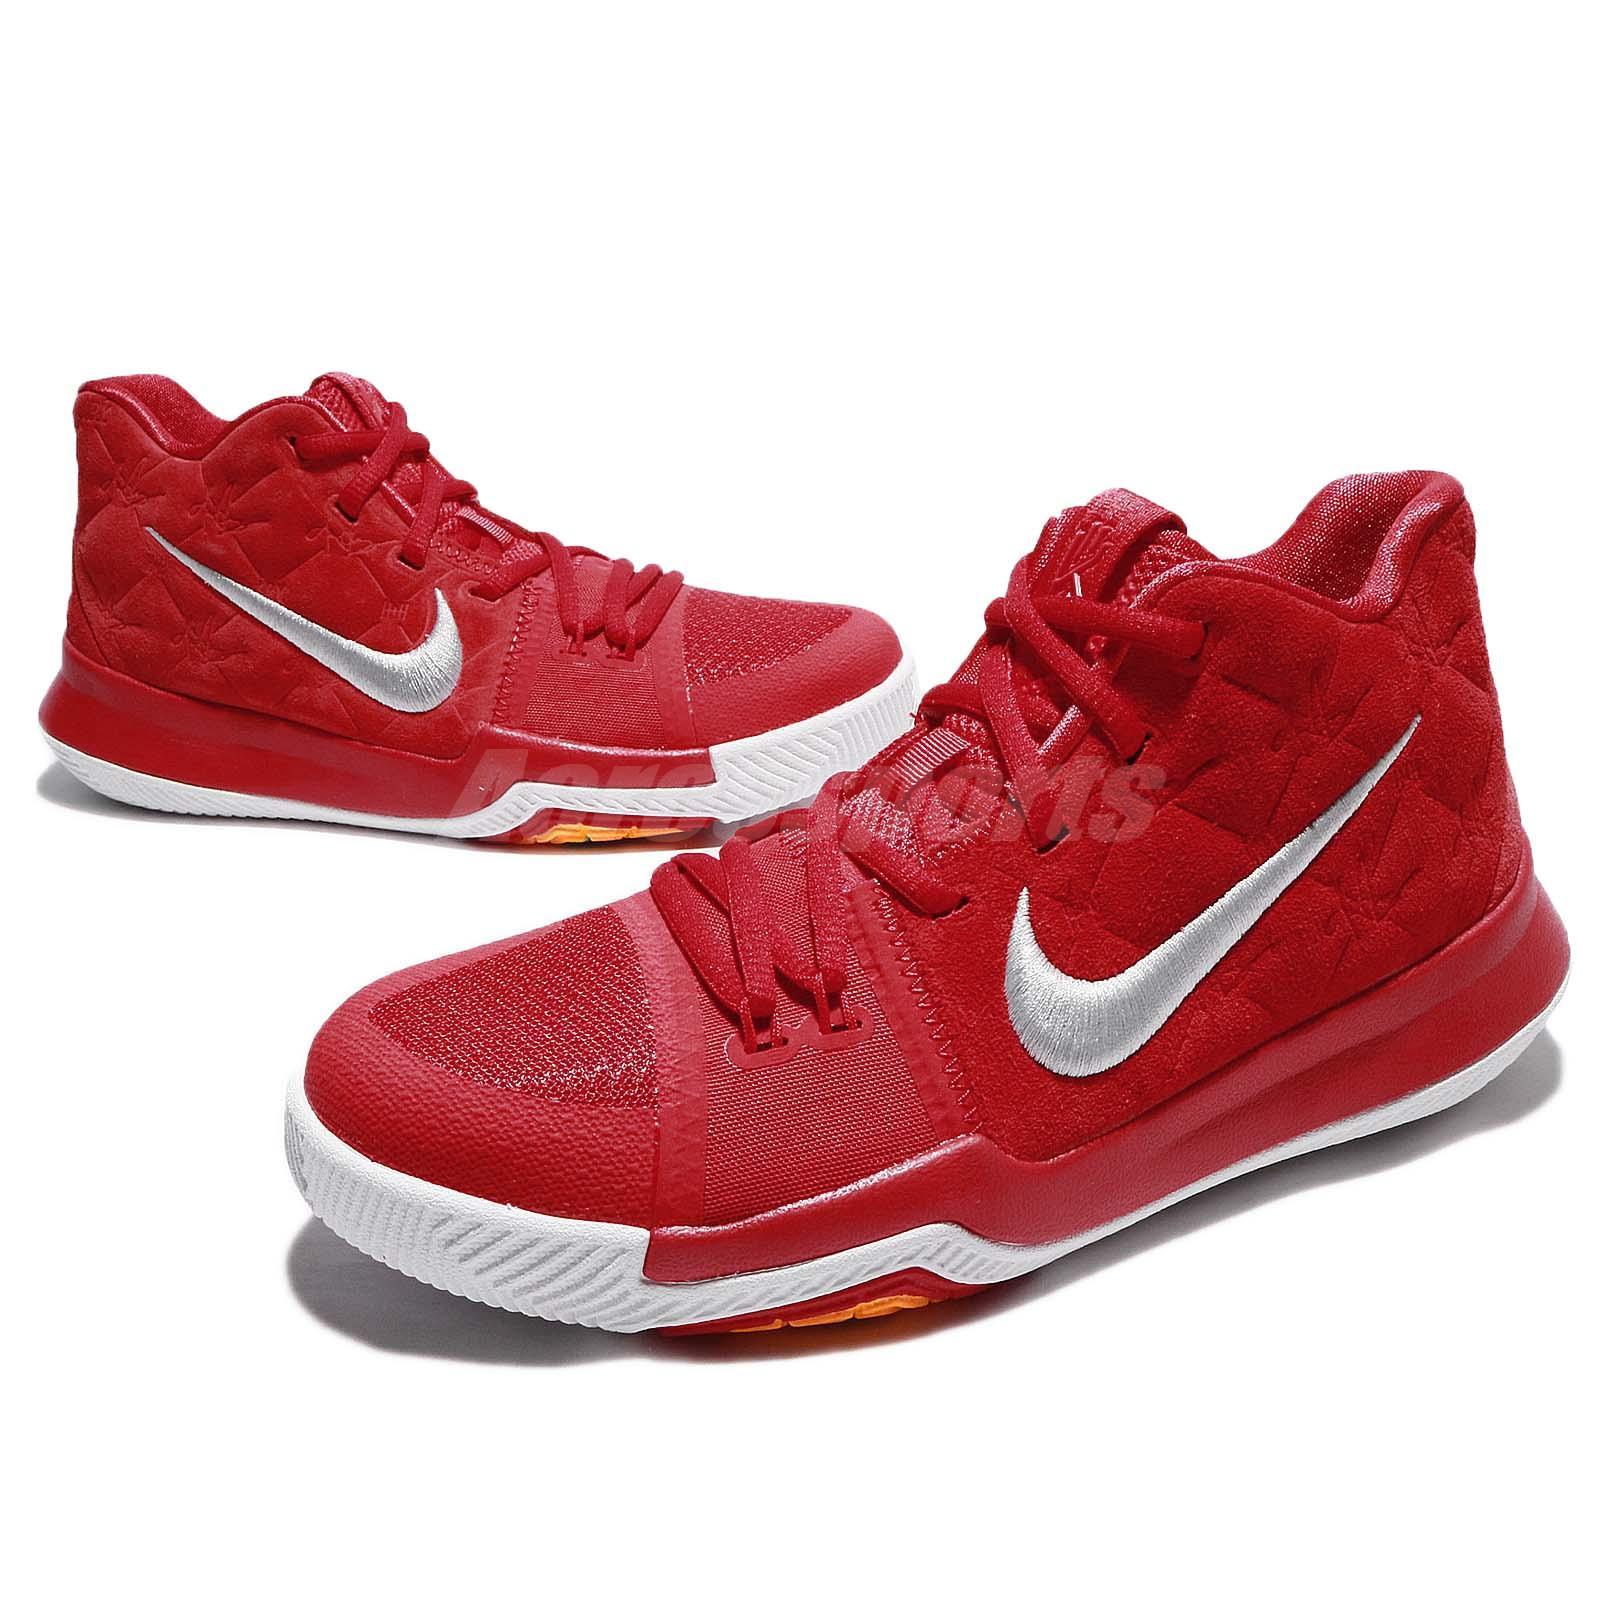 sports shoes df1e0 62098 ... usa nike kyrie 3 gs iii university red white kids women basketball  shoes 0c5f5 bdb88